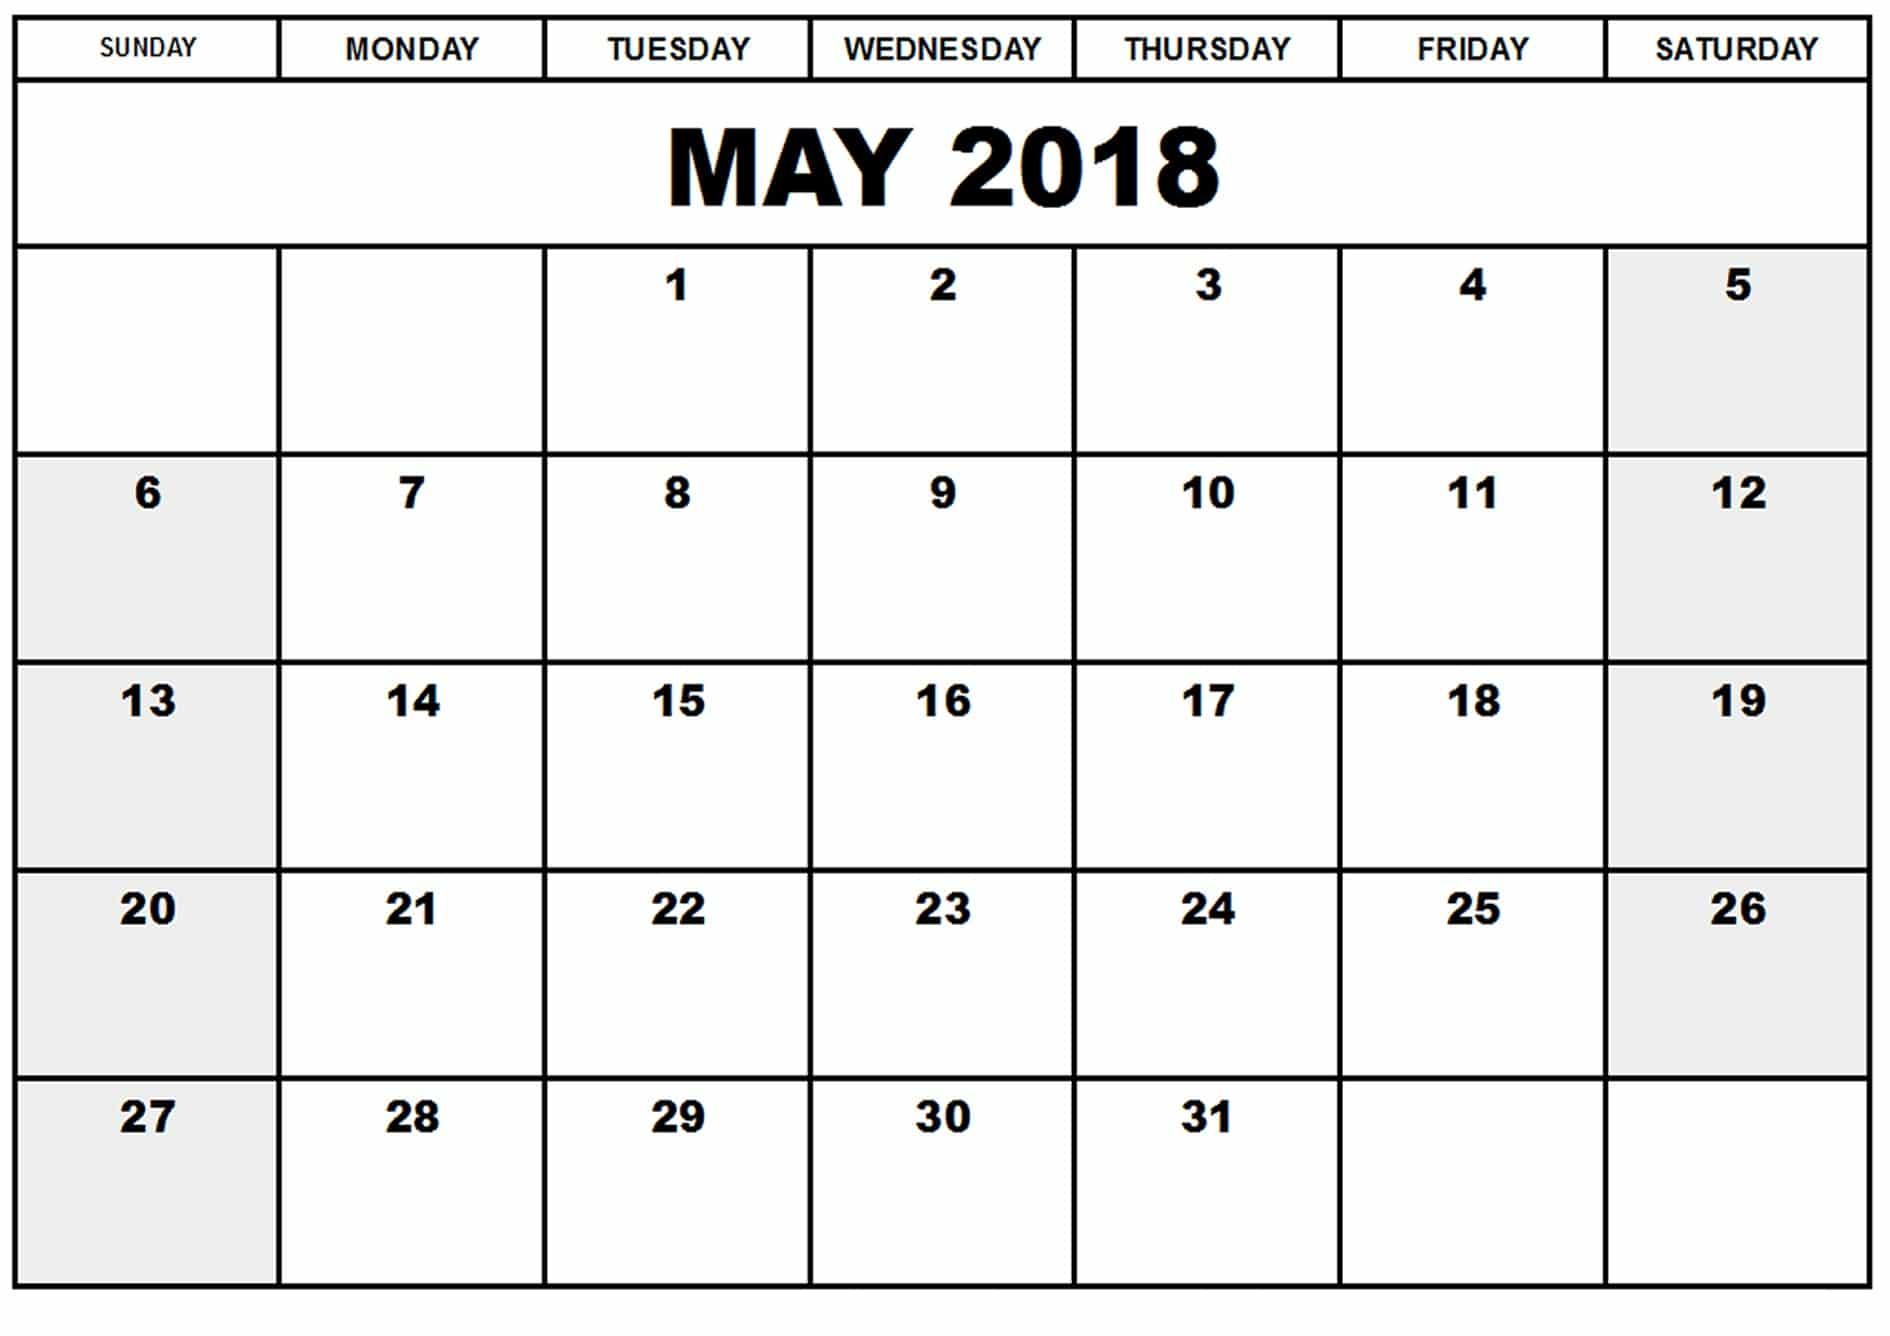 Blank May 2018 Calendar With Holidays